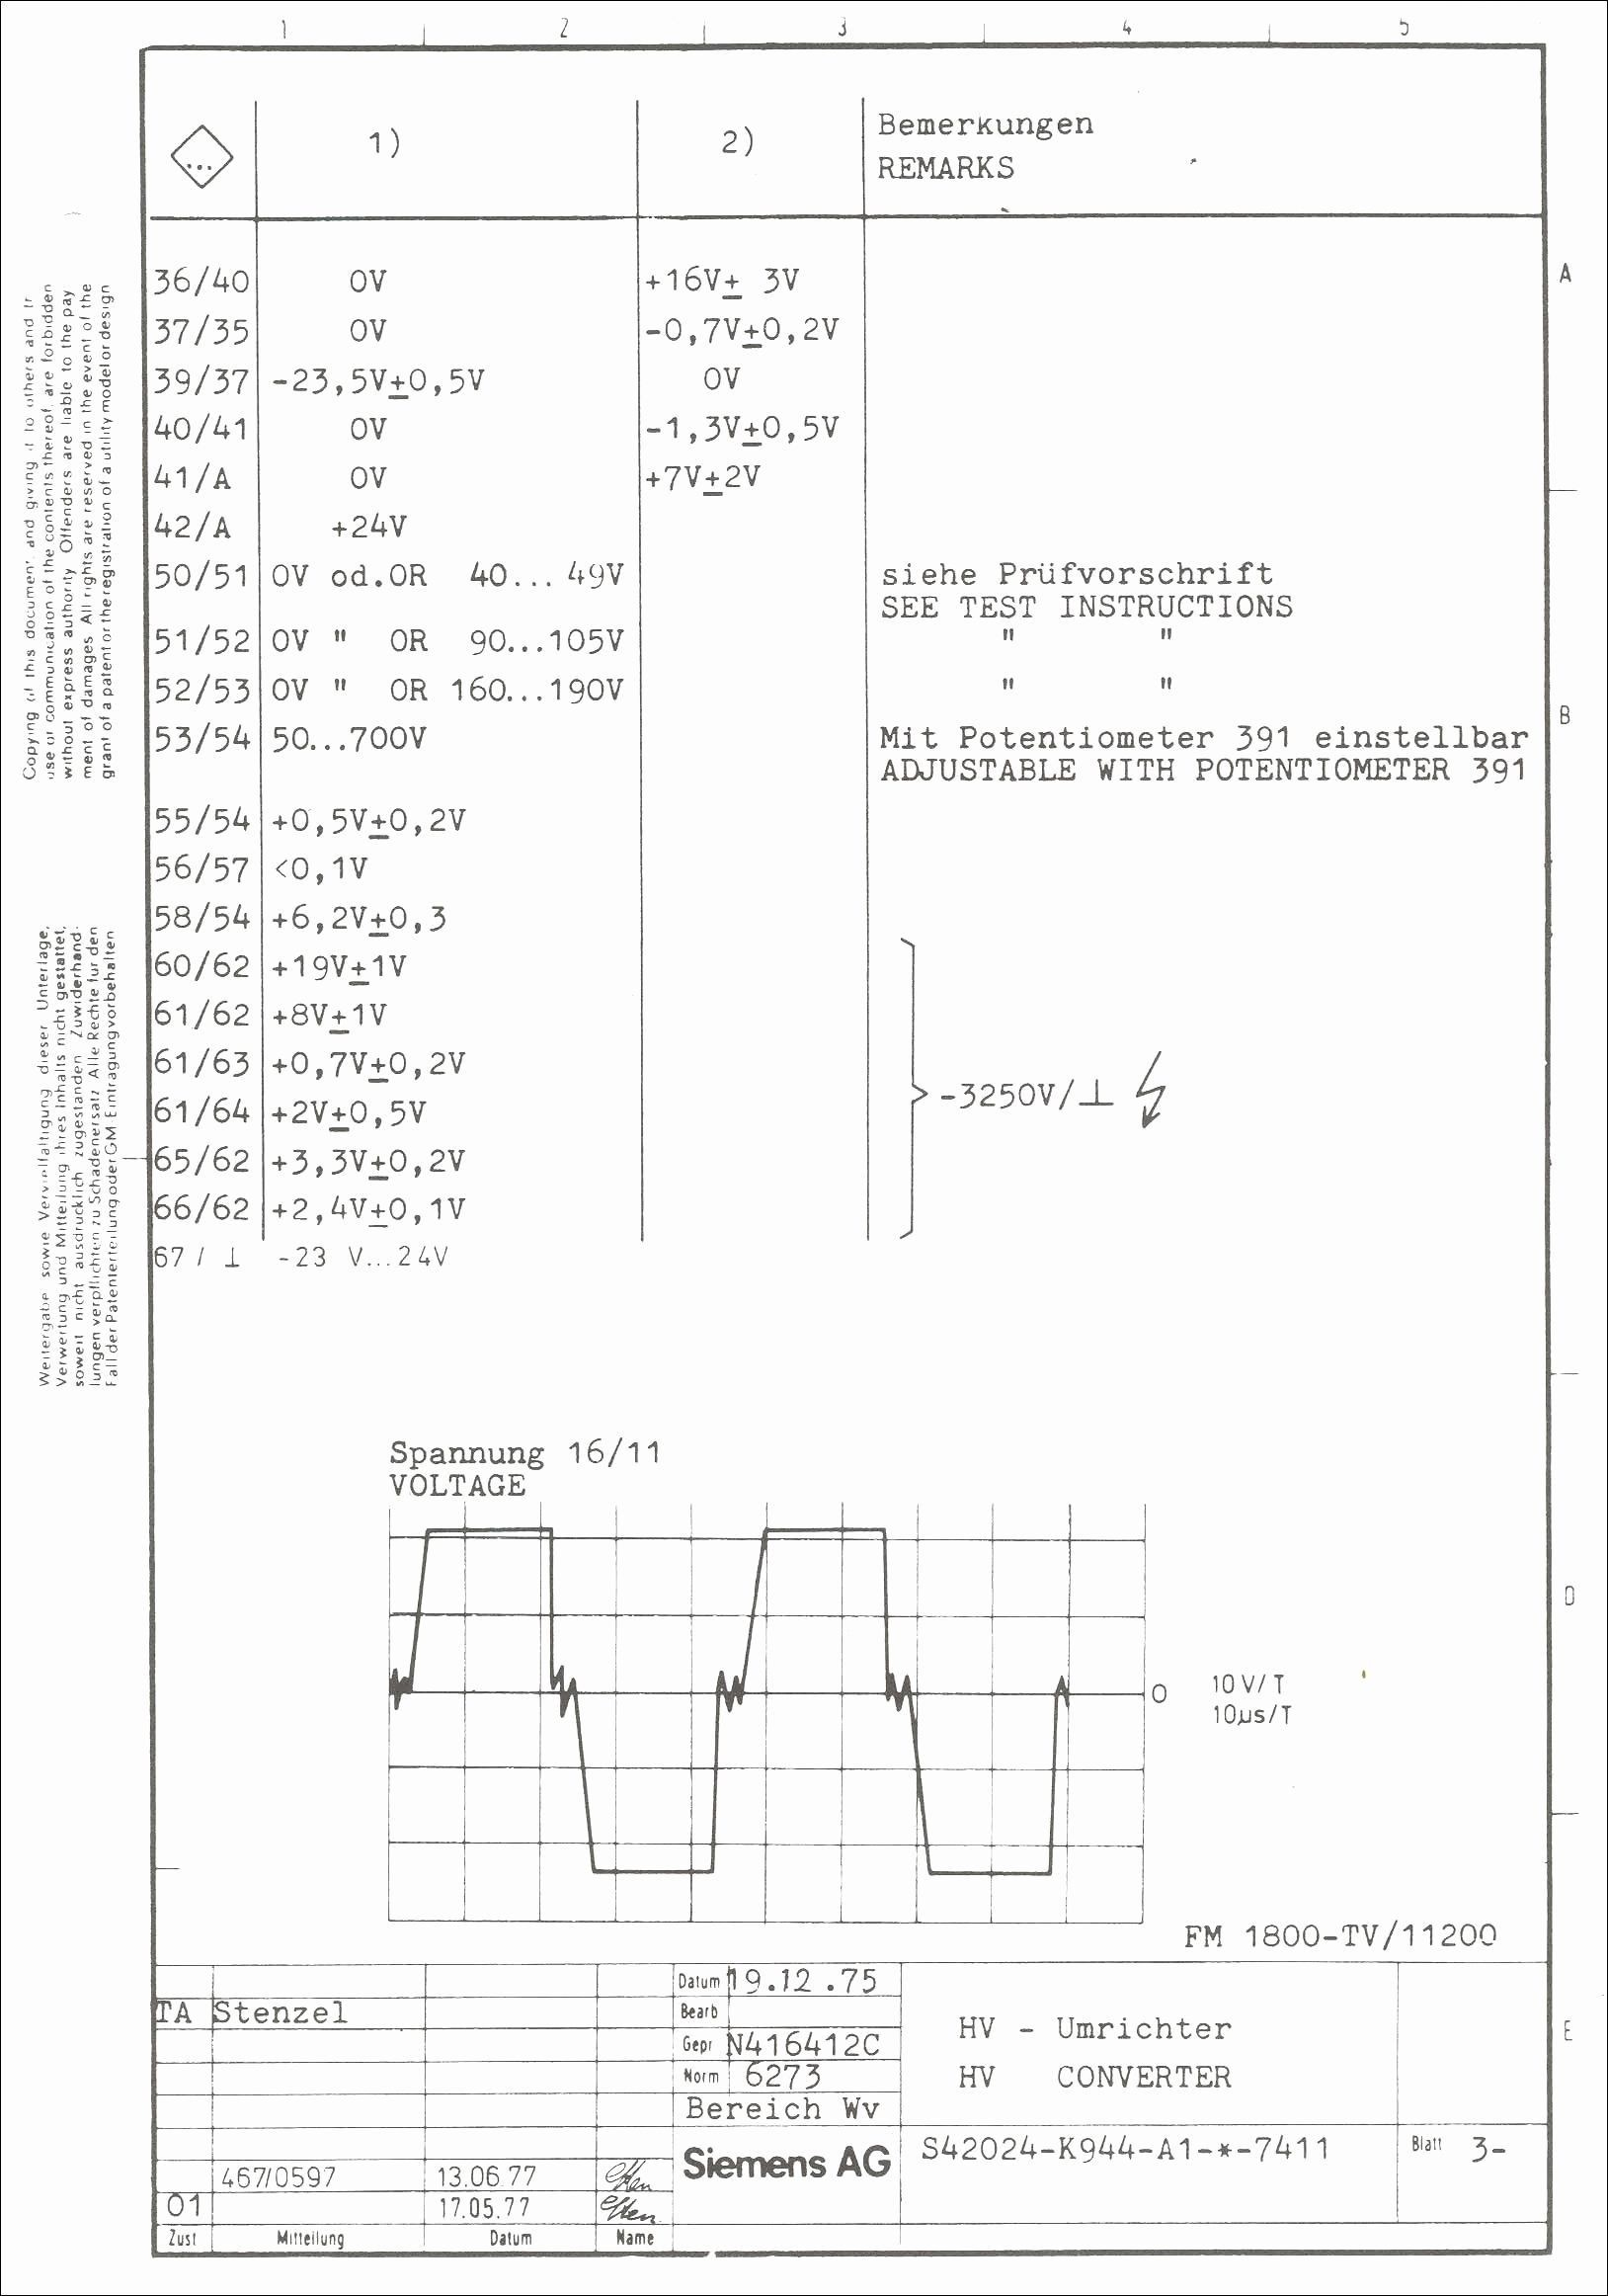 05 Trailblazer Radio Wire Diagrams Proline Car Stereo Wiring Diagram Of 05 Trailblazer Radio Wire Diagrams